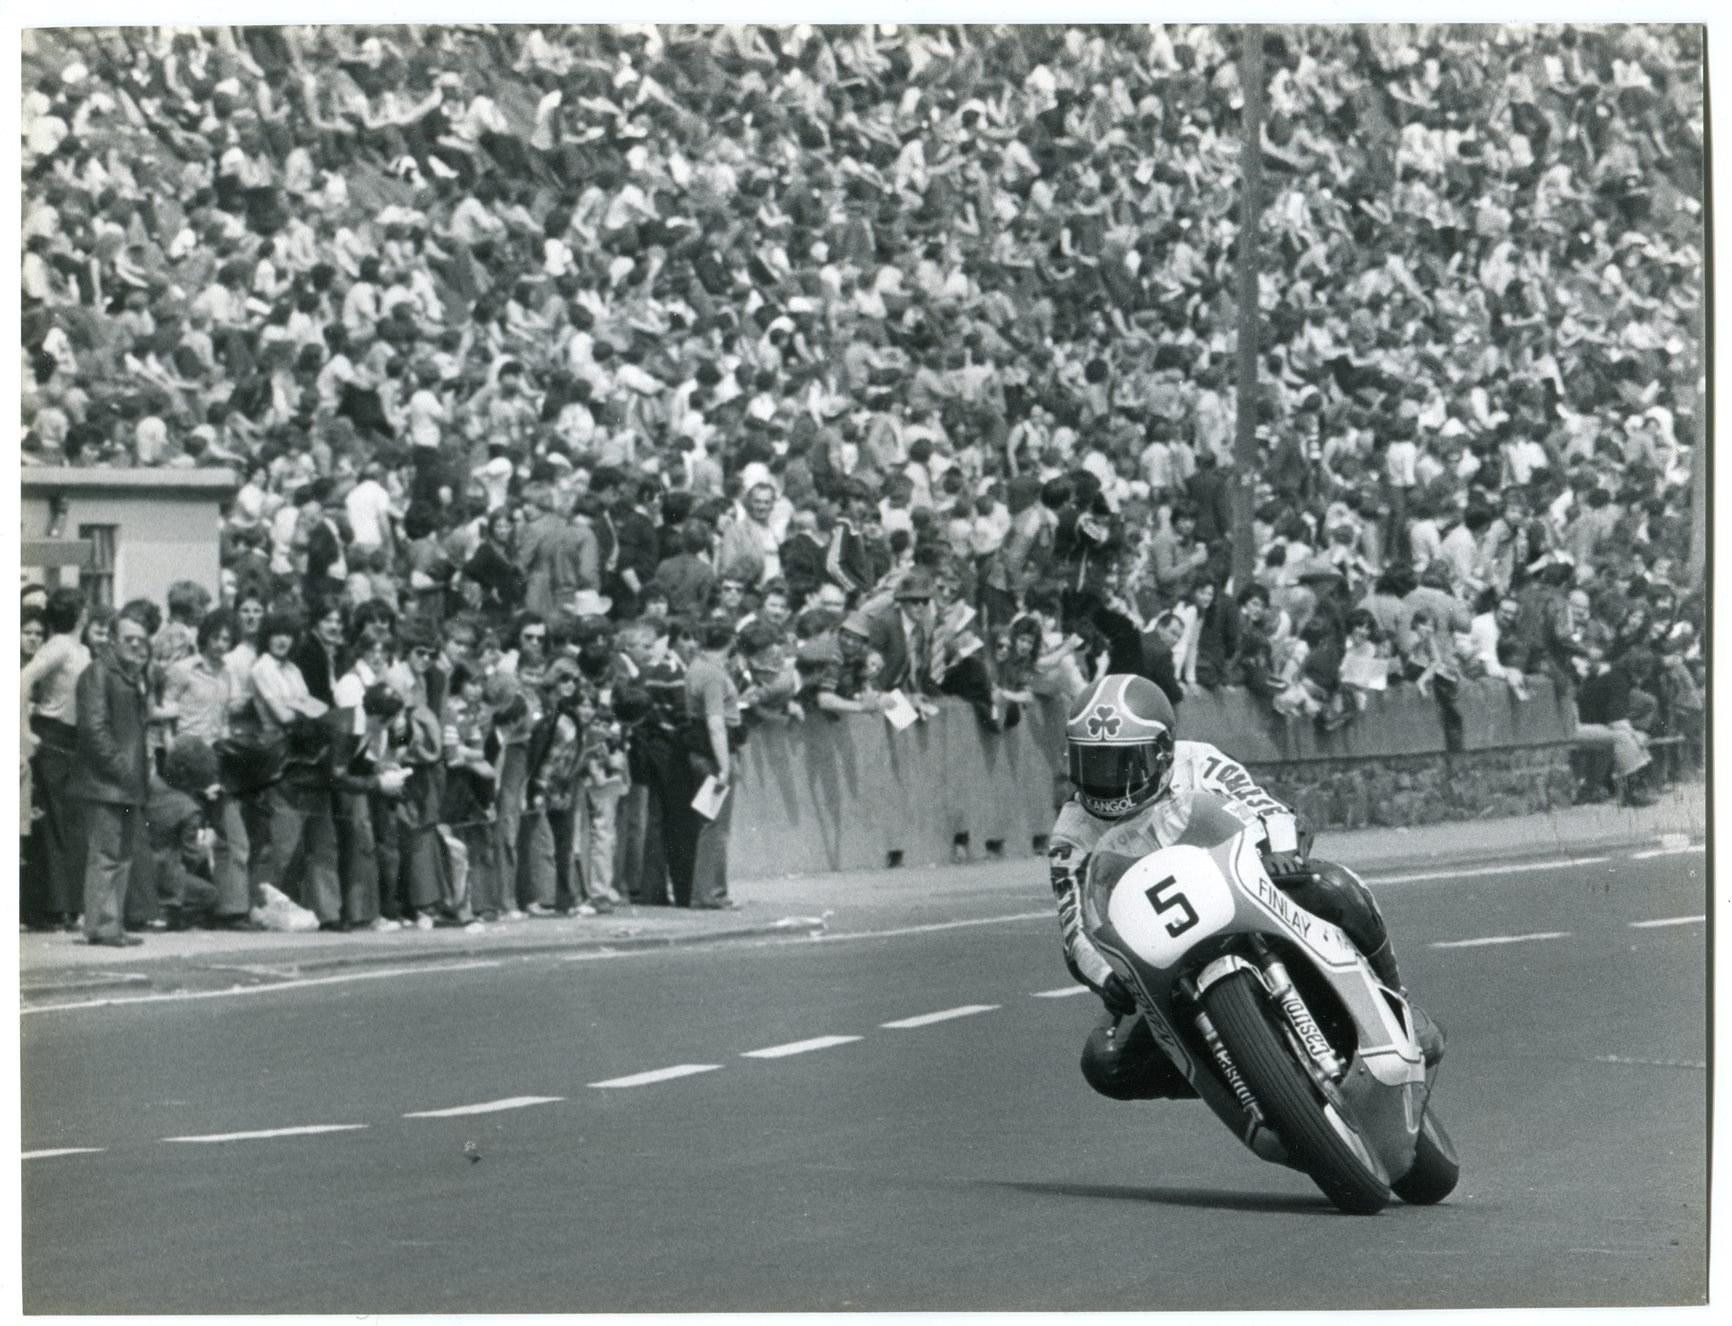 15-Per-Cent-Racing-Through-Years-VF.jpg#asset:9202